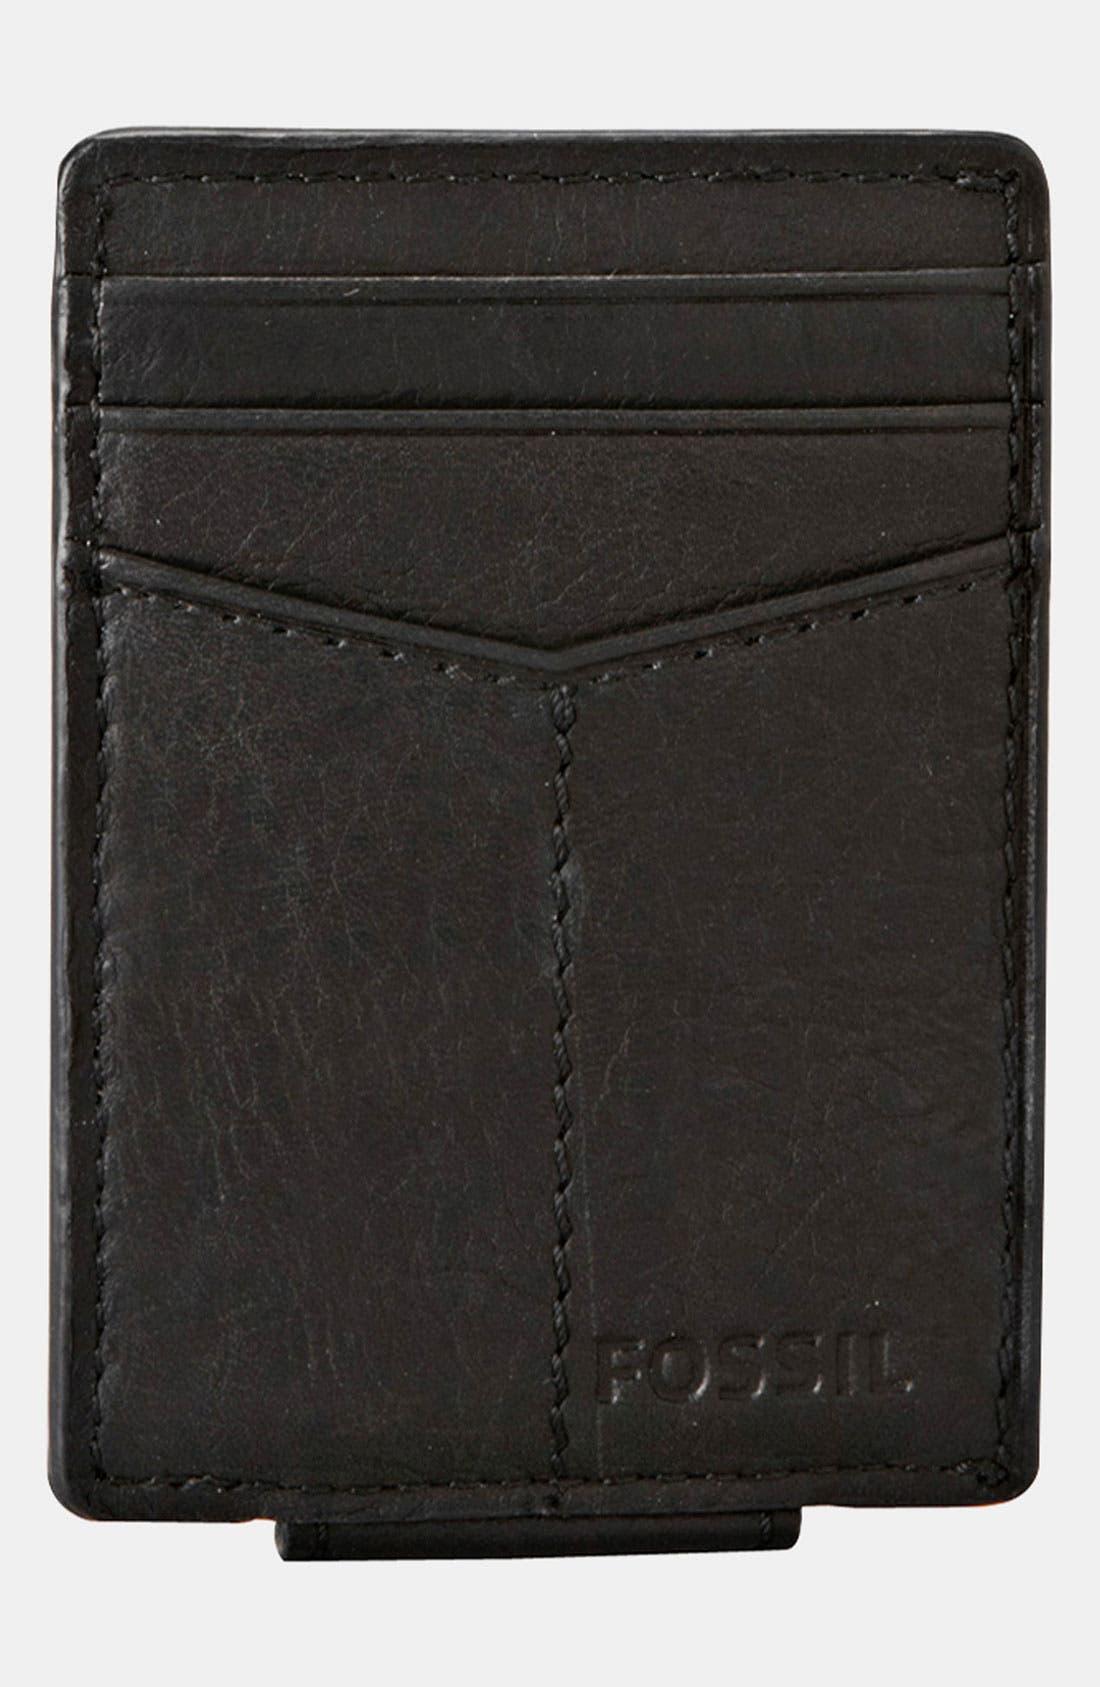 'Ingram' Leather Magnetic Money Clip Card Case,                             Alternate thumbnail 2, color,                             001